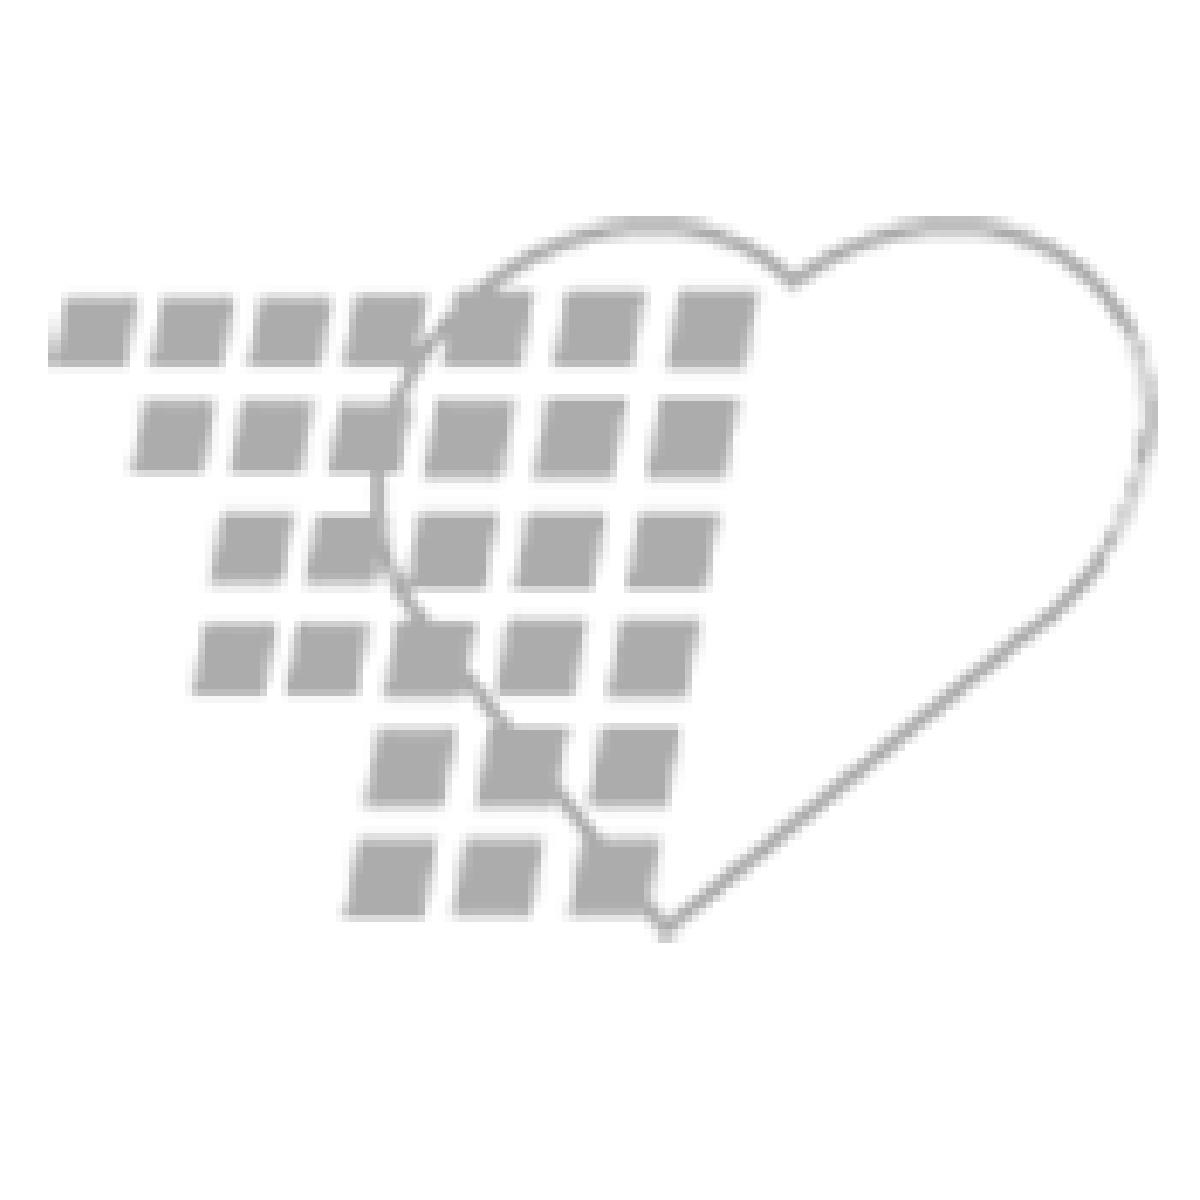 06-82-6546 BD™ PosiFlush™ Normal Saline 10 mL Fill Syringe - 10mL Diameter